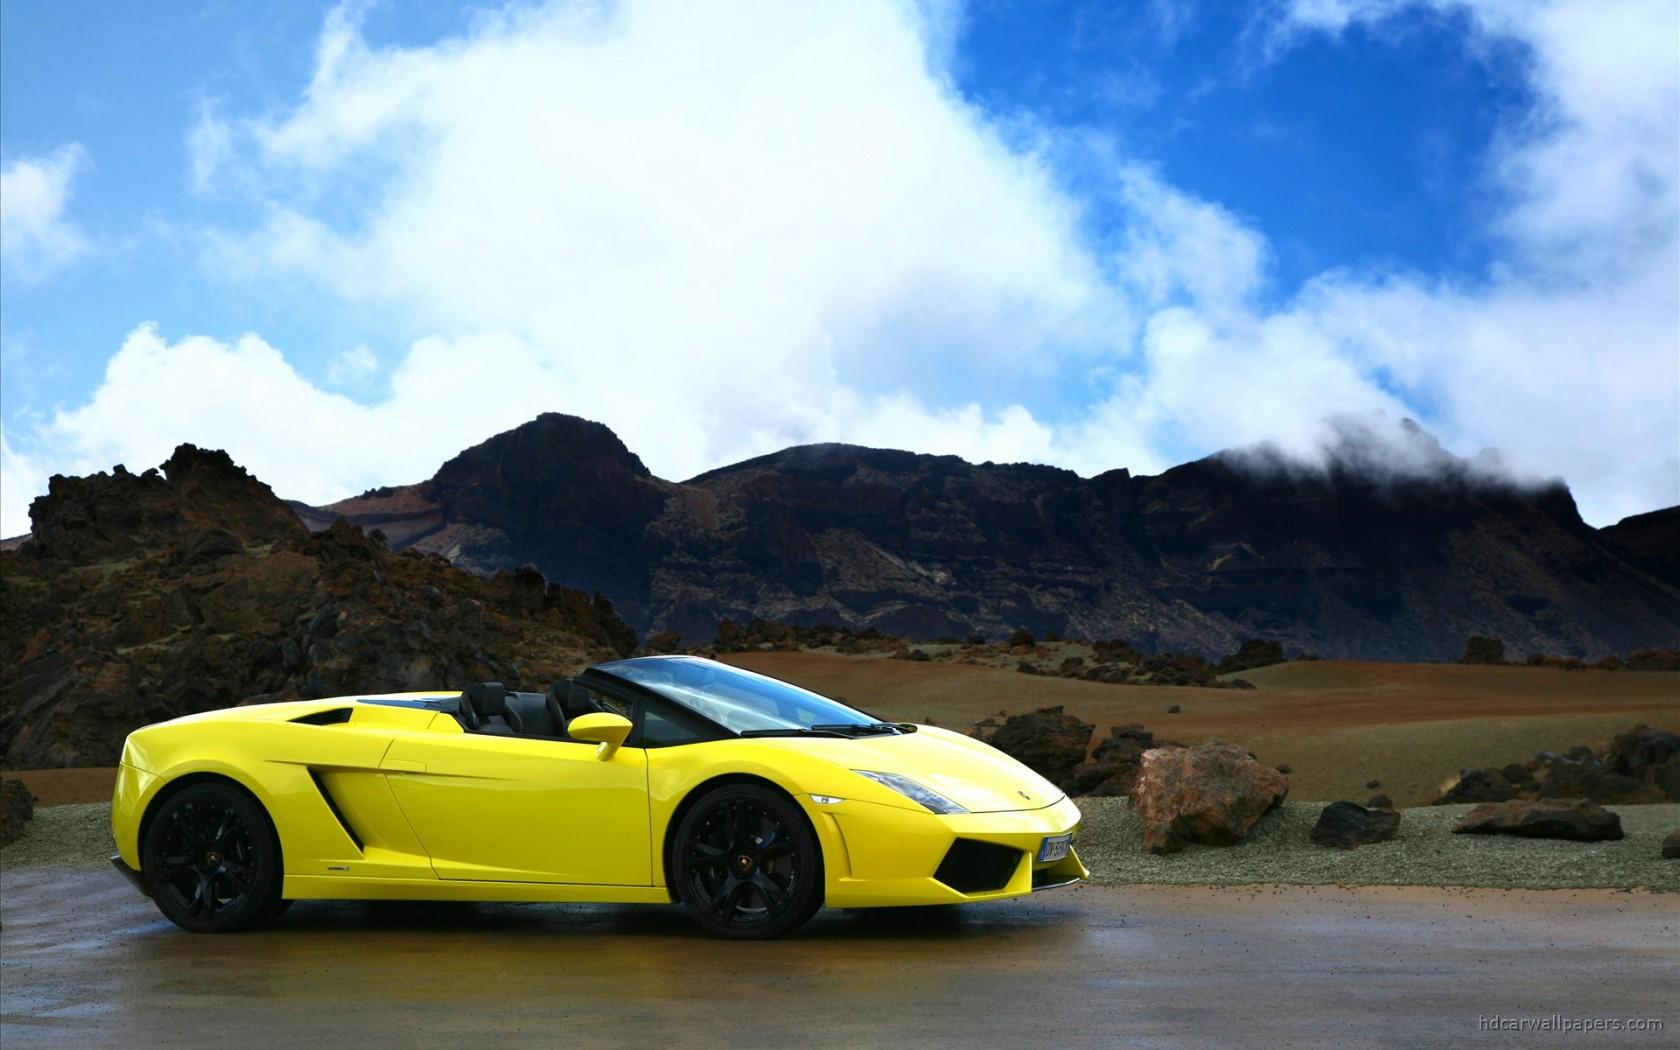 3d Car Wallpapers For Android 2009 Lamborghini Gallardo Lp560 4 Spyder 4 Wallpapers Hd